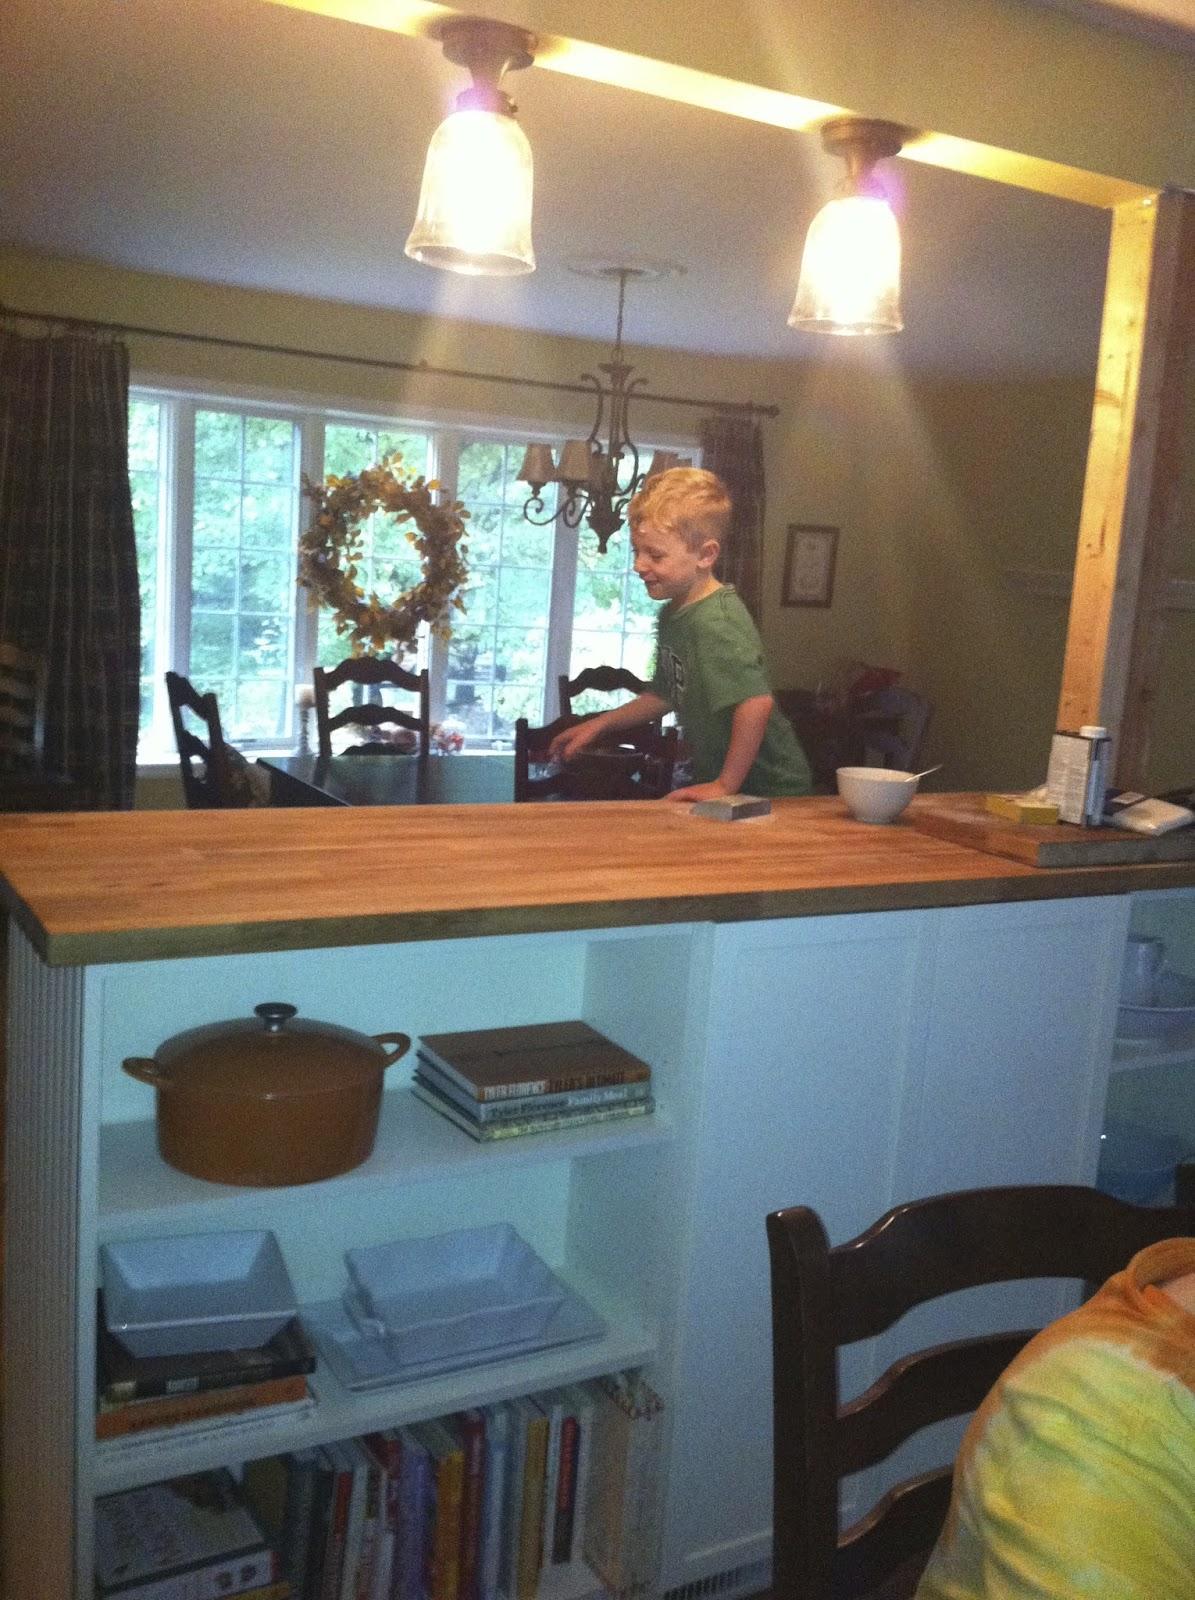 golden boys and me bookshelves turned kitchen island ikea hack